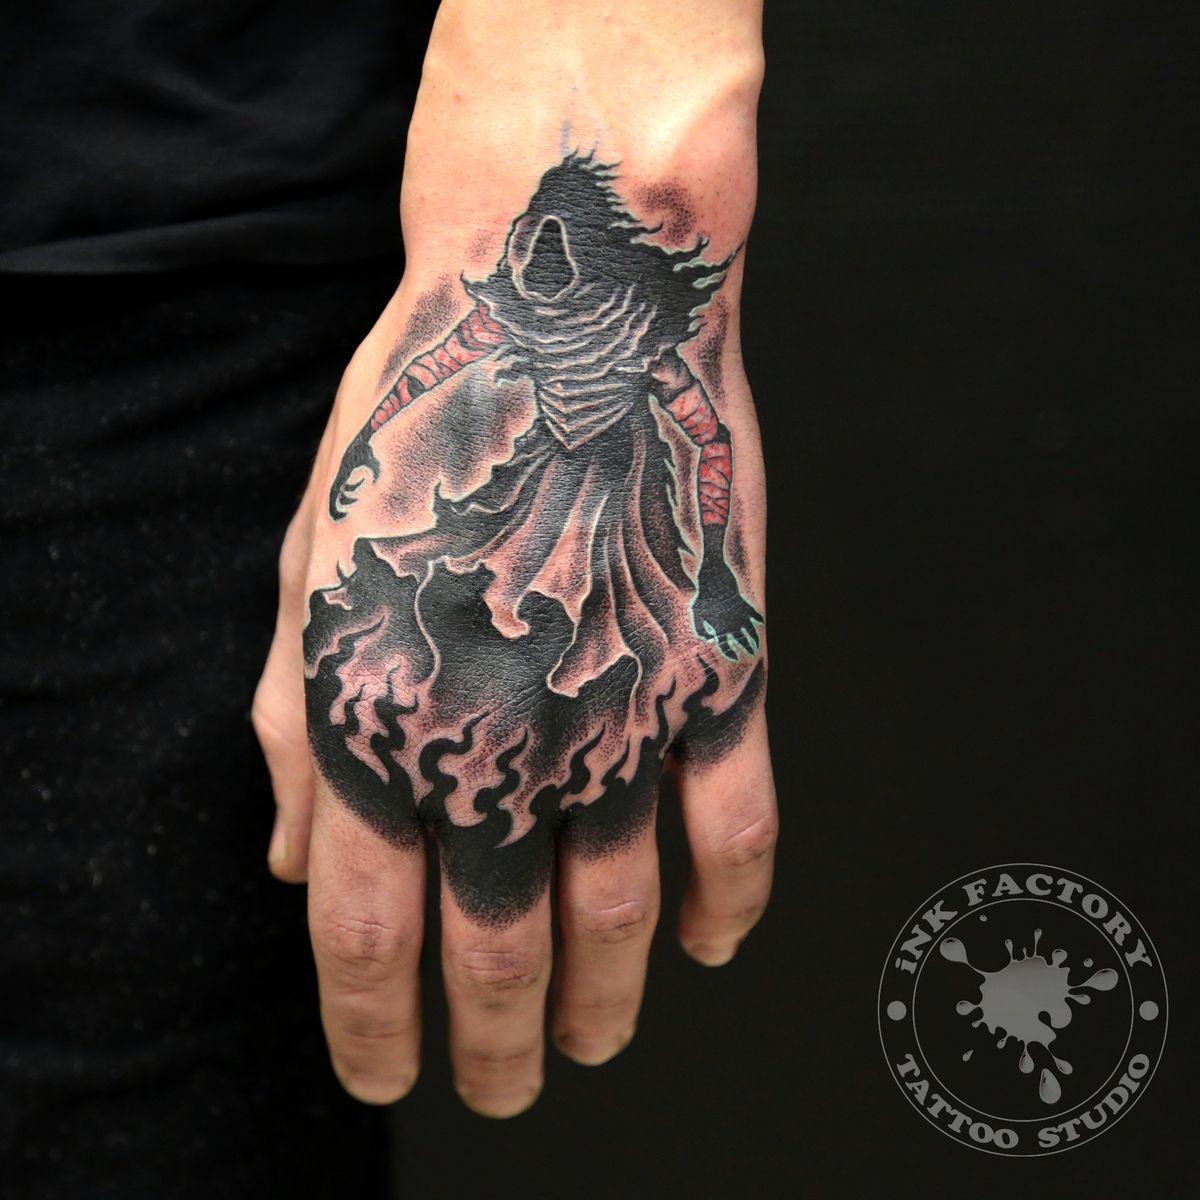 фото тату Скандинавский стиль в тату 626